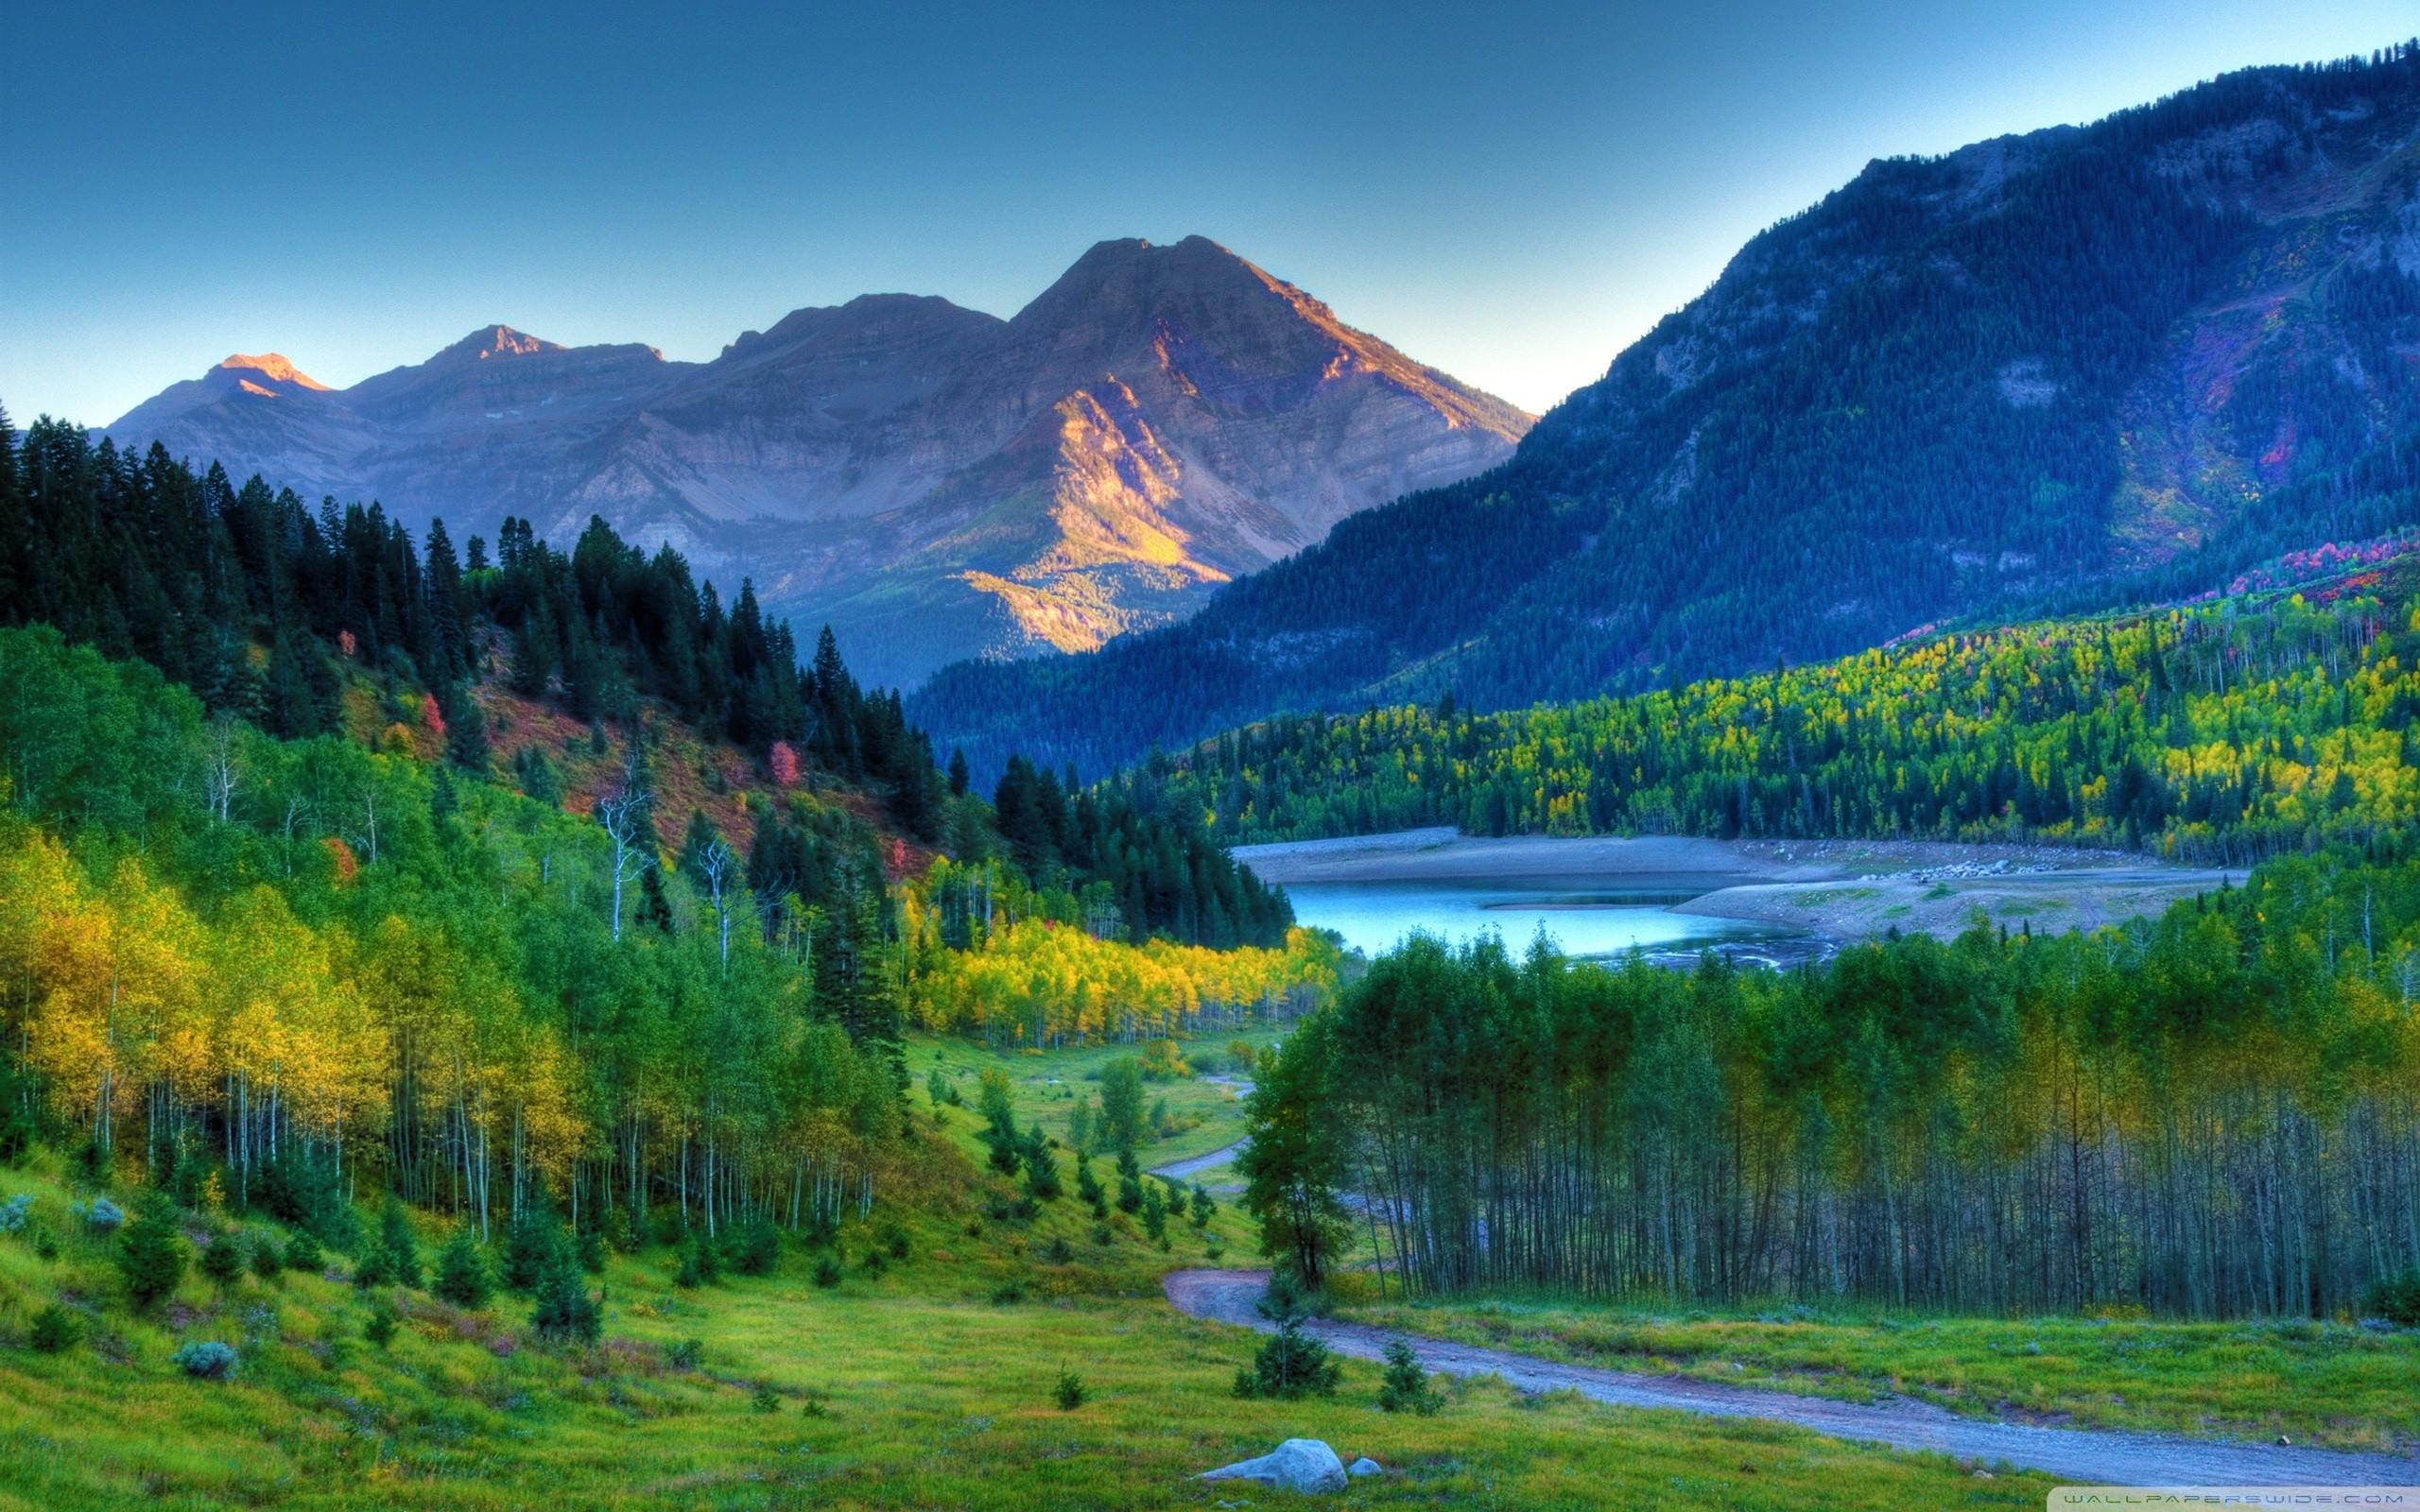 Landscape Desktop Backgrounds  WallpaperSafari